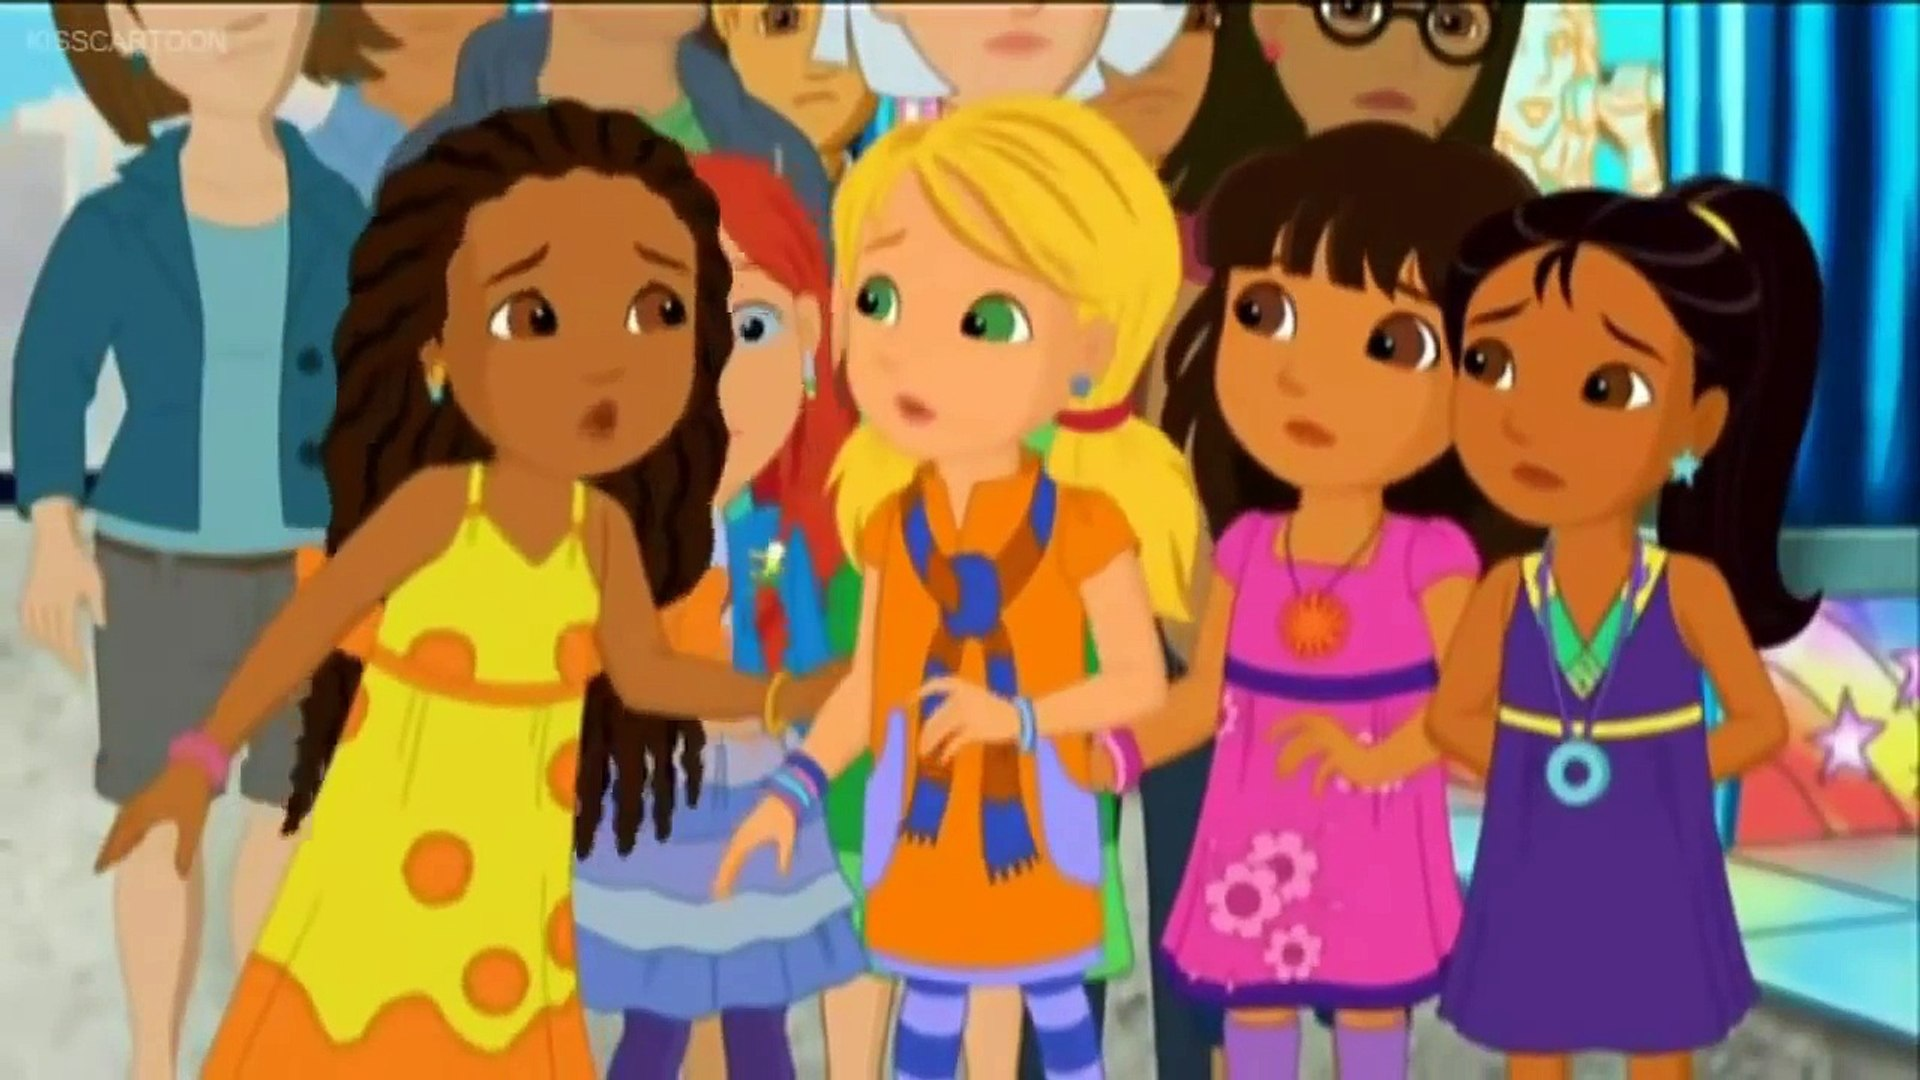 Friendship Friendship Cartoon Hd Images